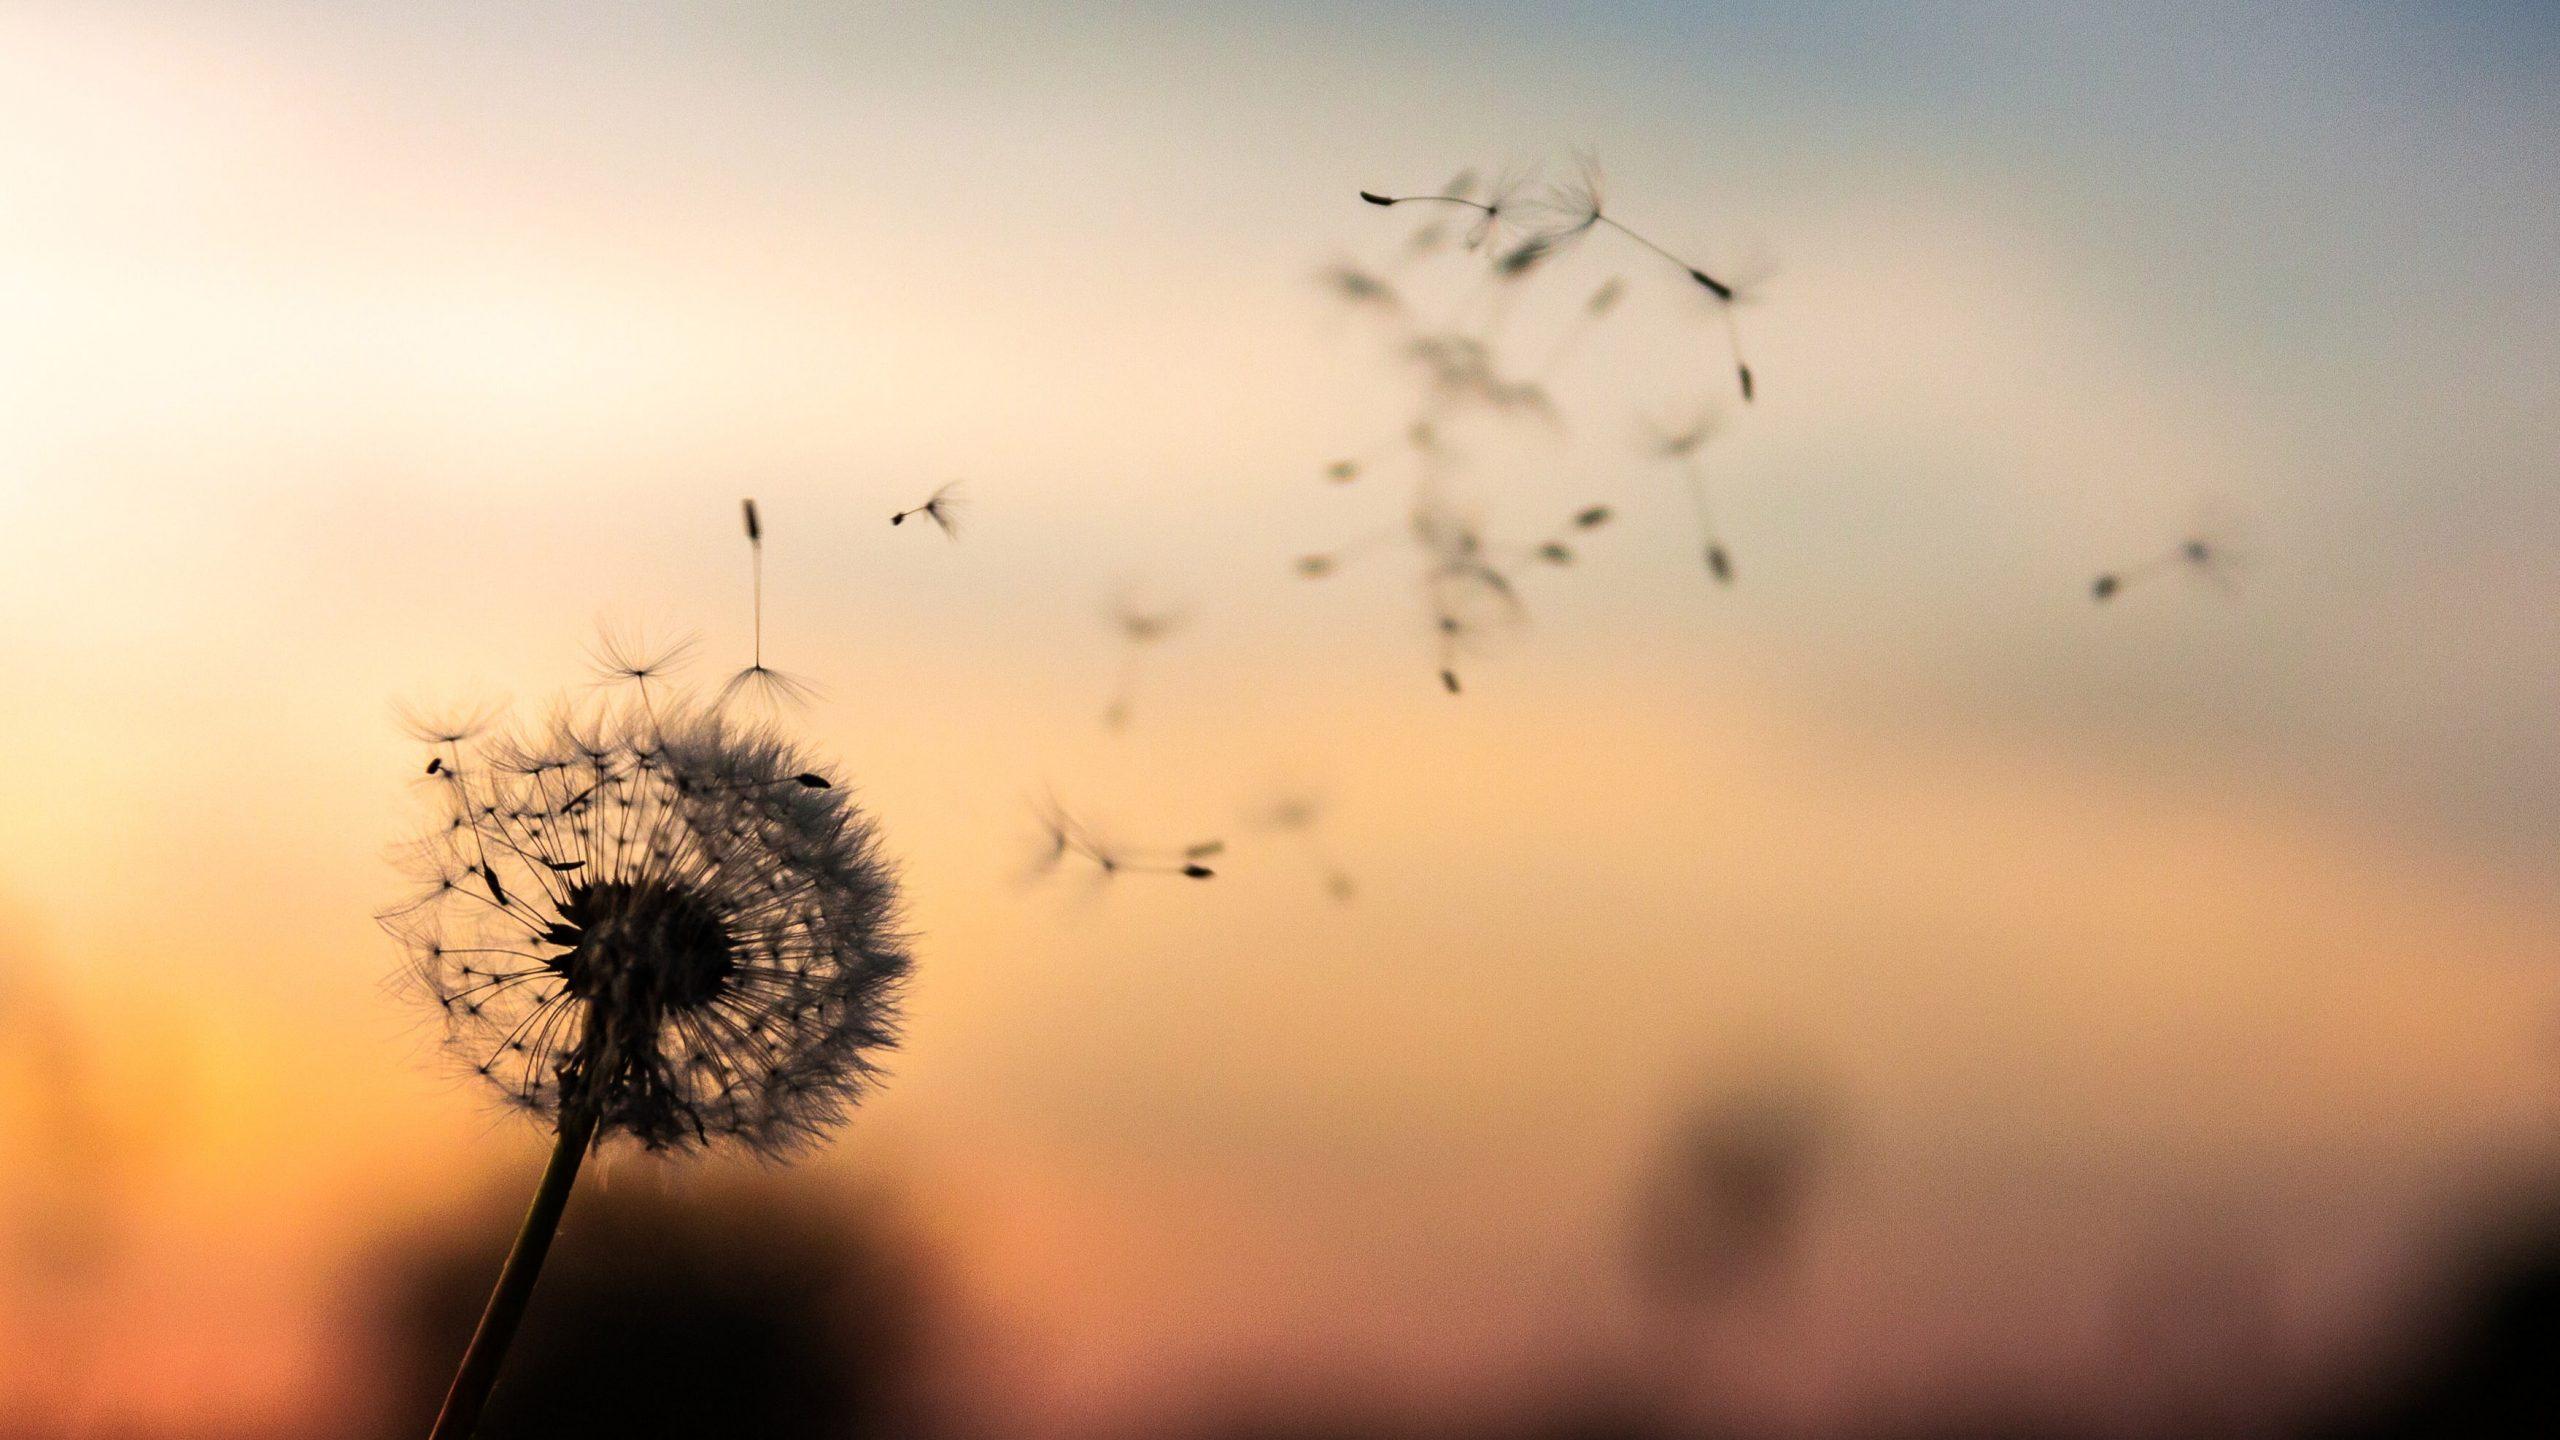 A dandelion being blown in the breeze